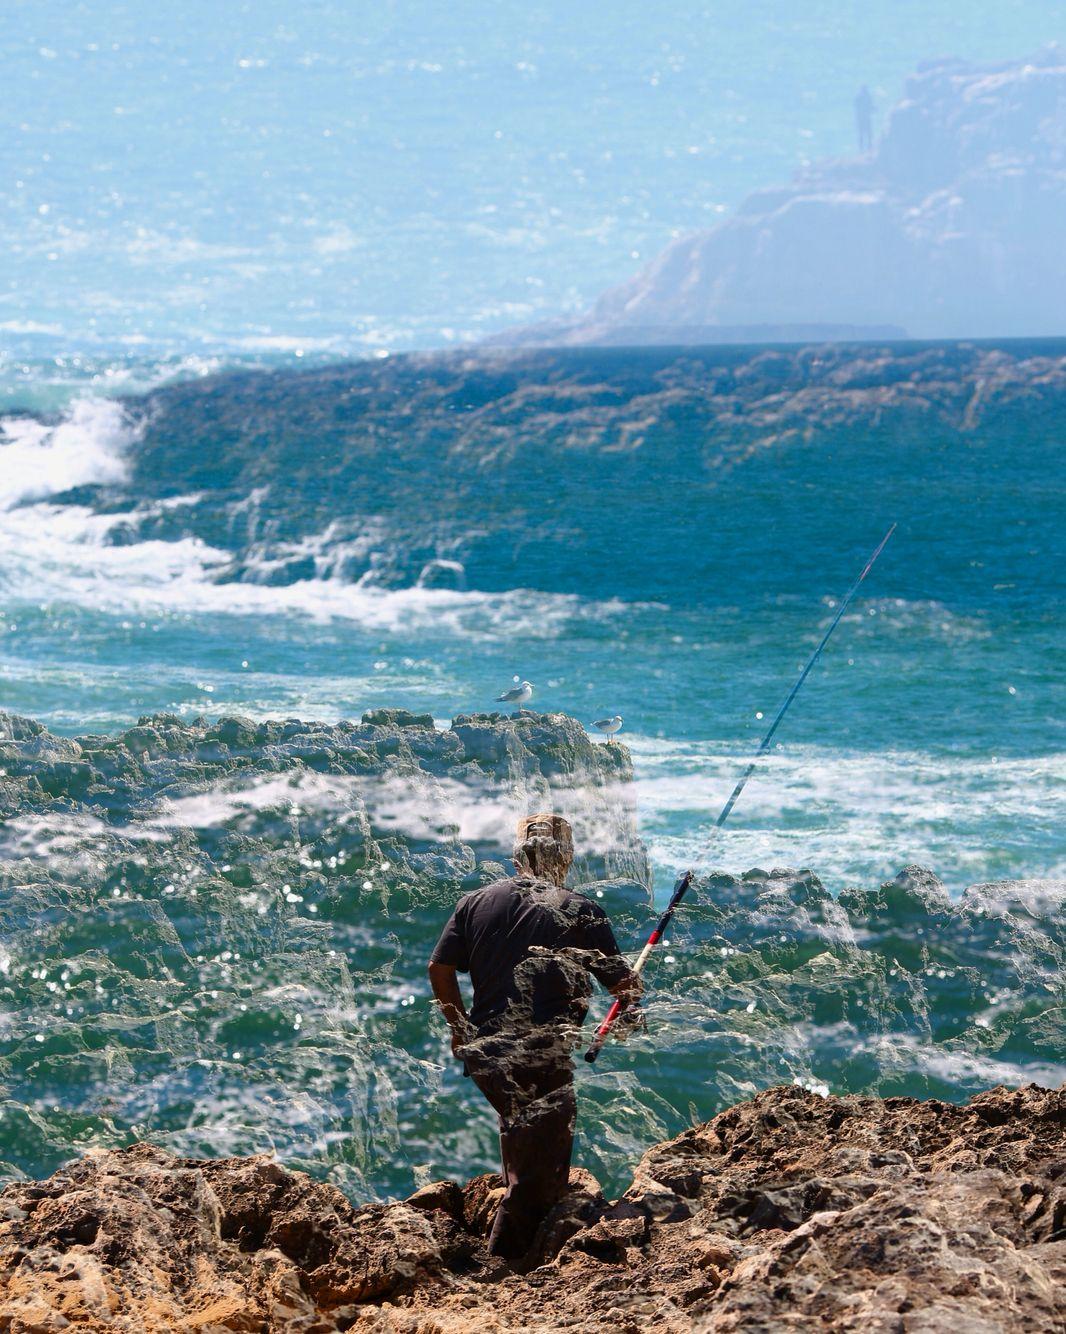 Fishermen in the edge. Henrique Da Ponte Photography